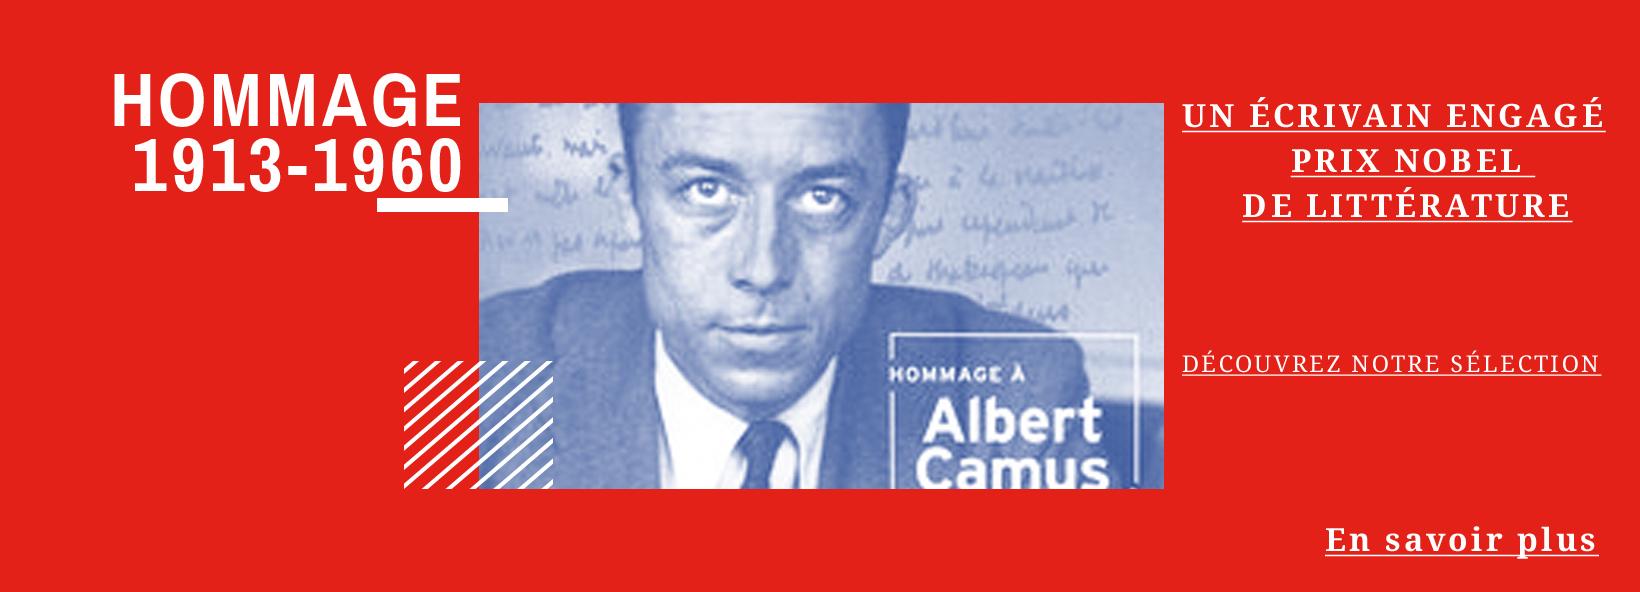 Hommage à Albert Camus (1913-1960)